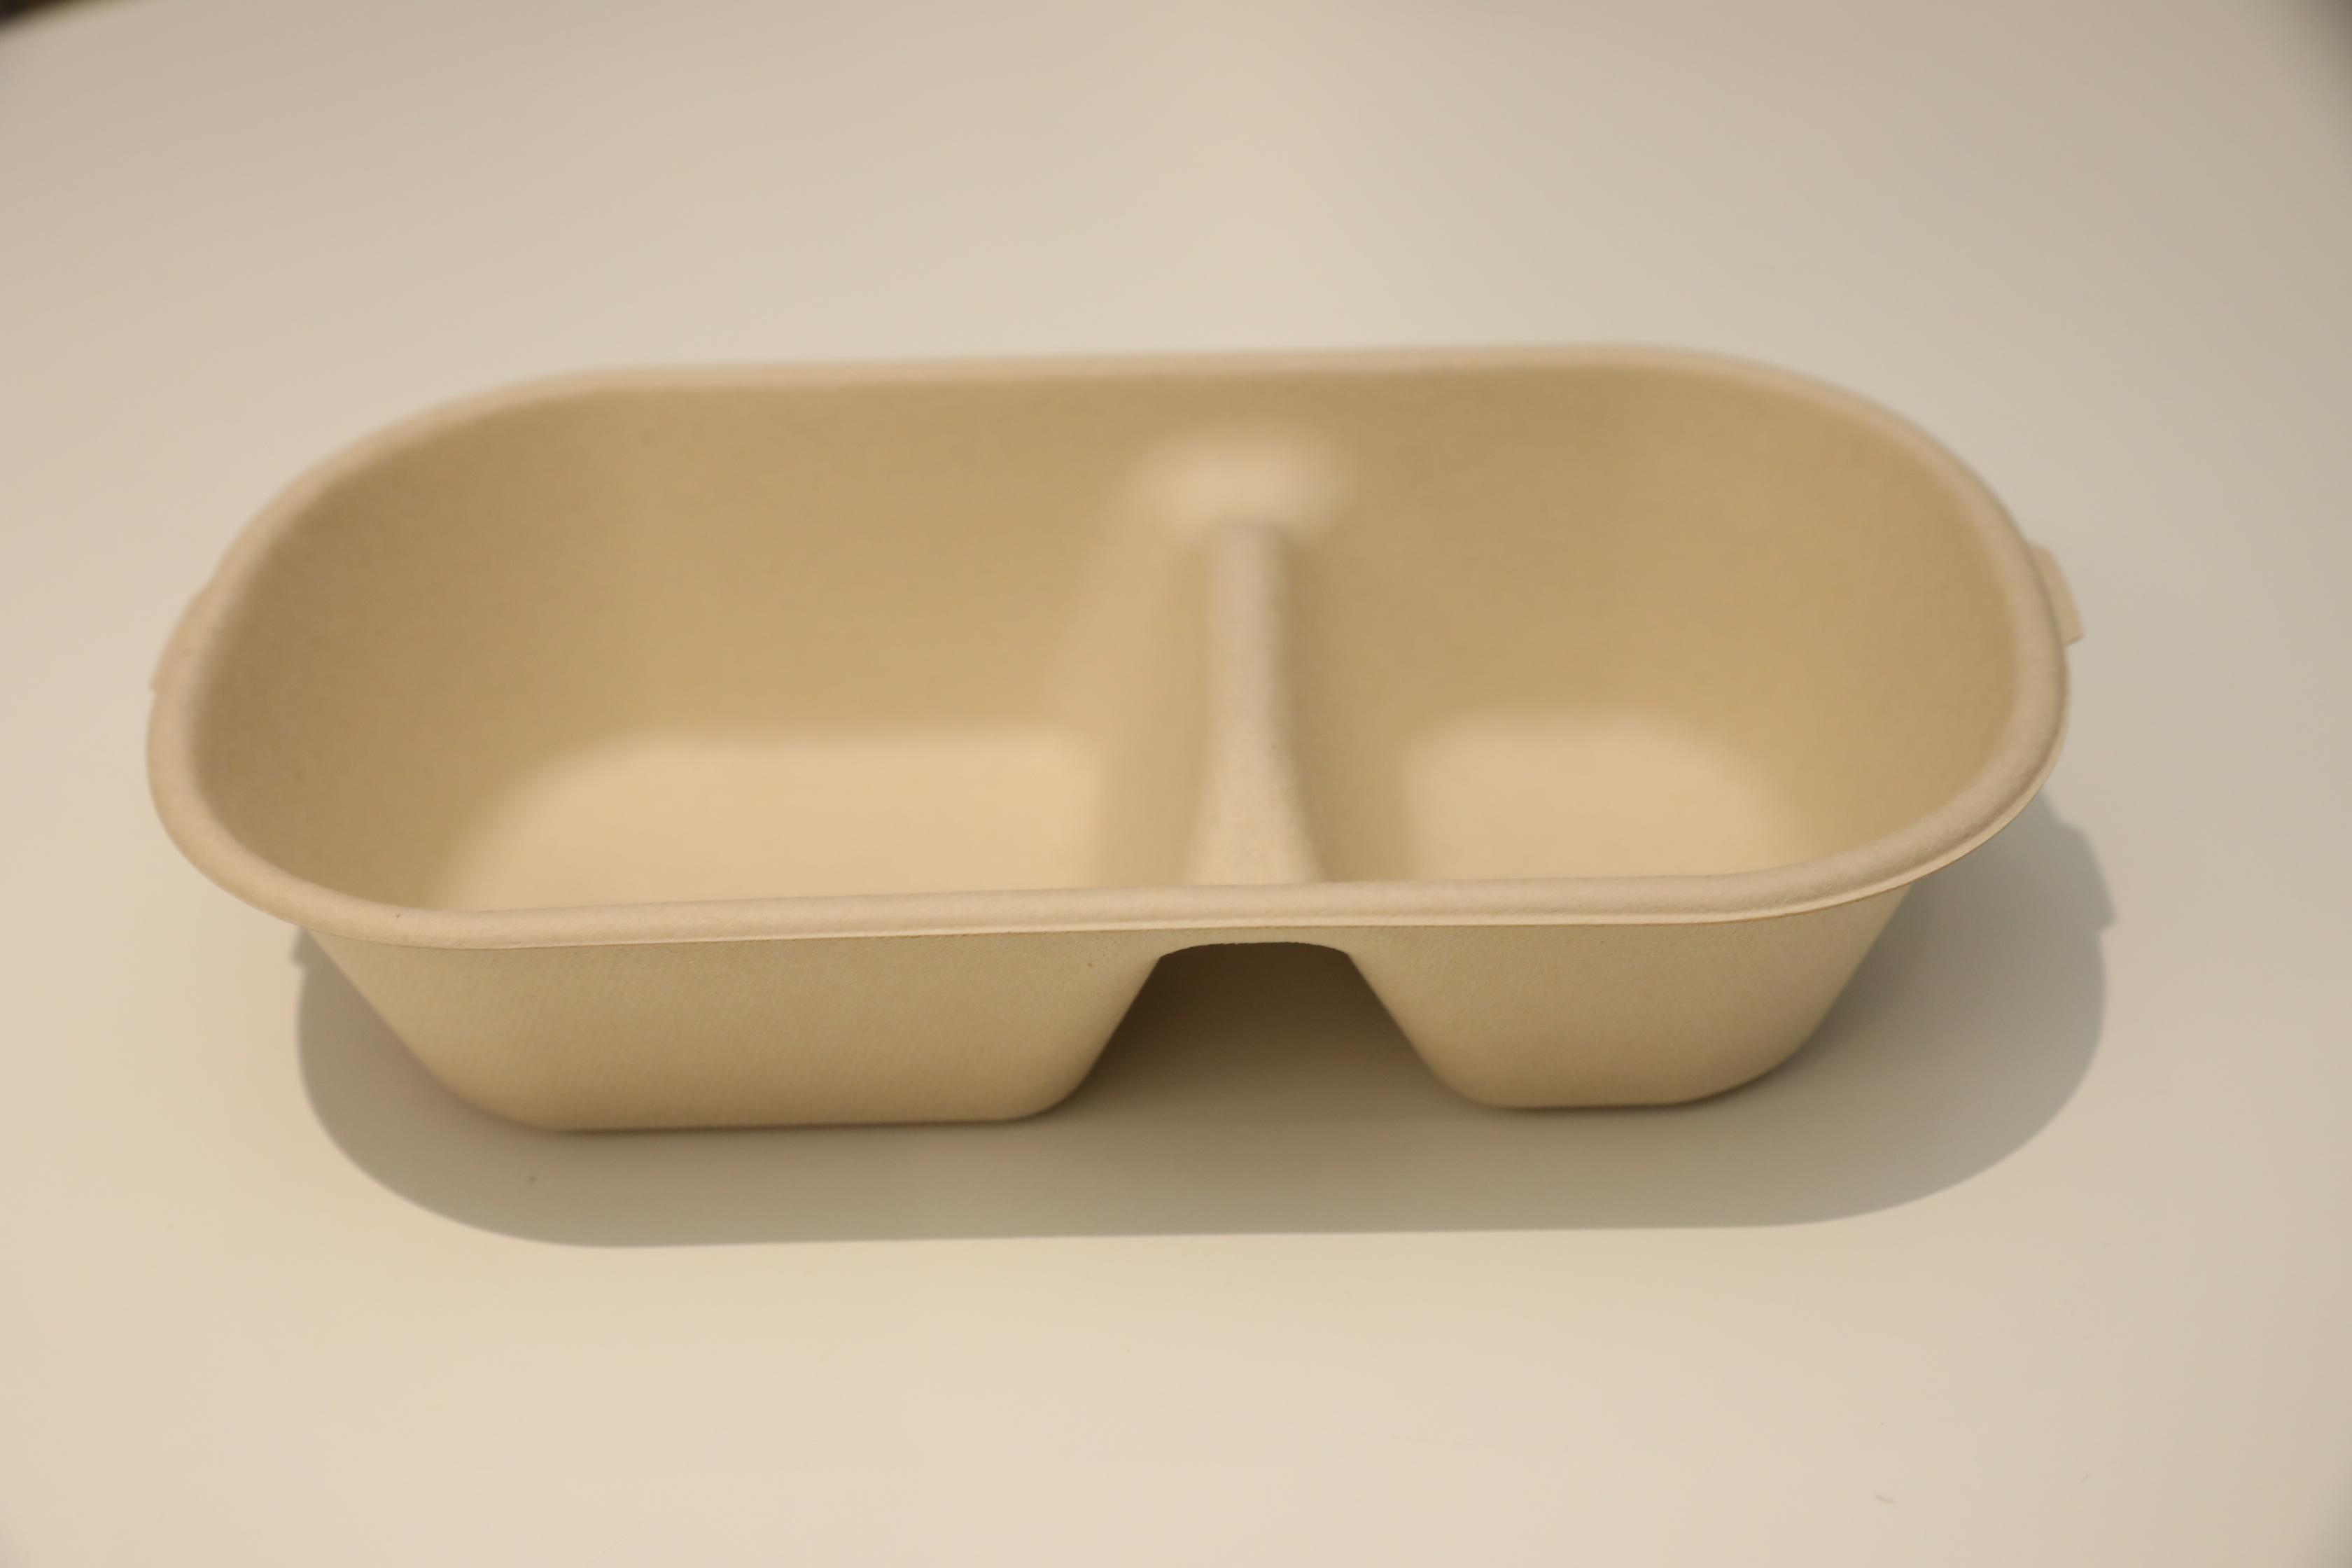 800ml 2-格午餐盒底T扣-L232xW133xH51